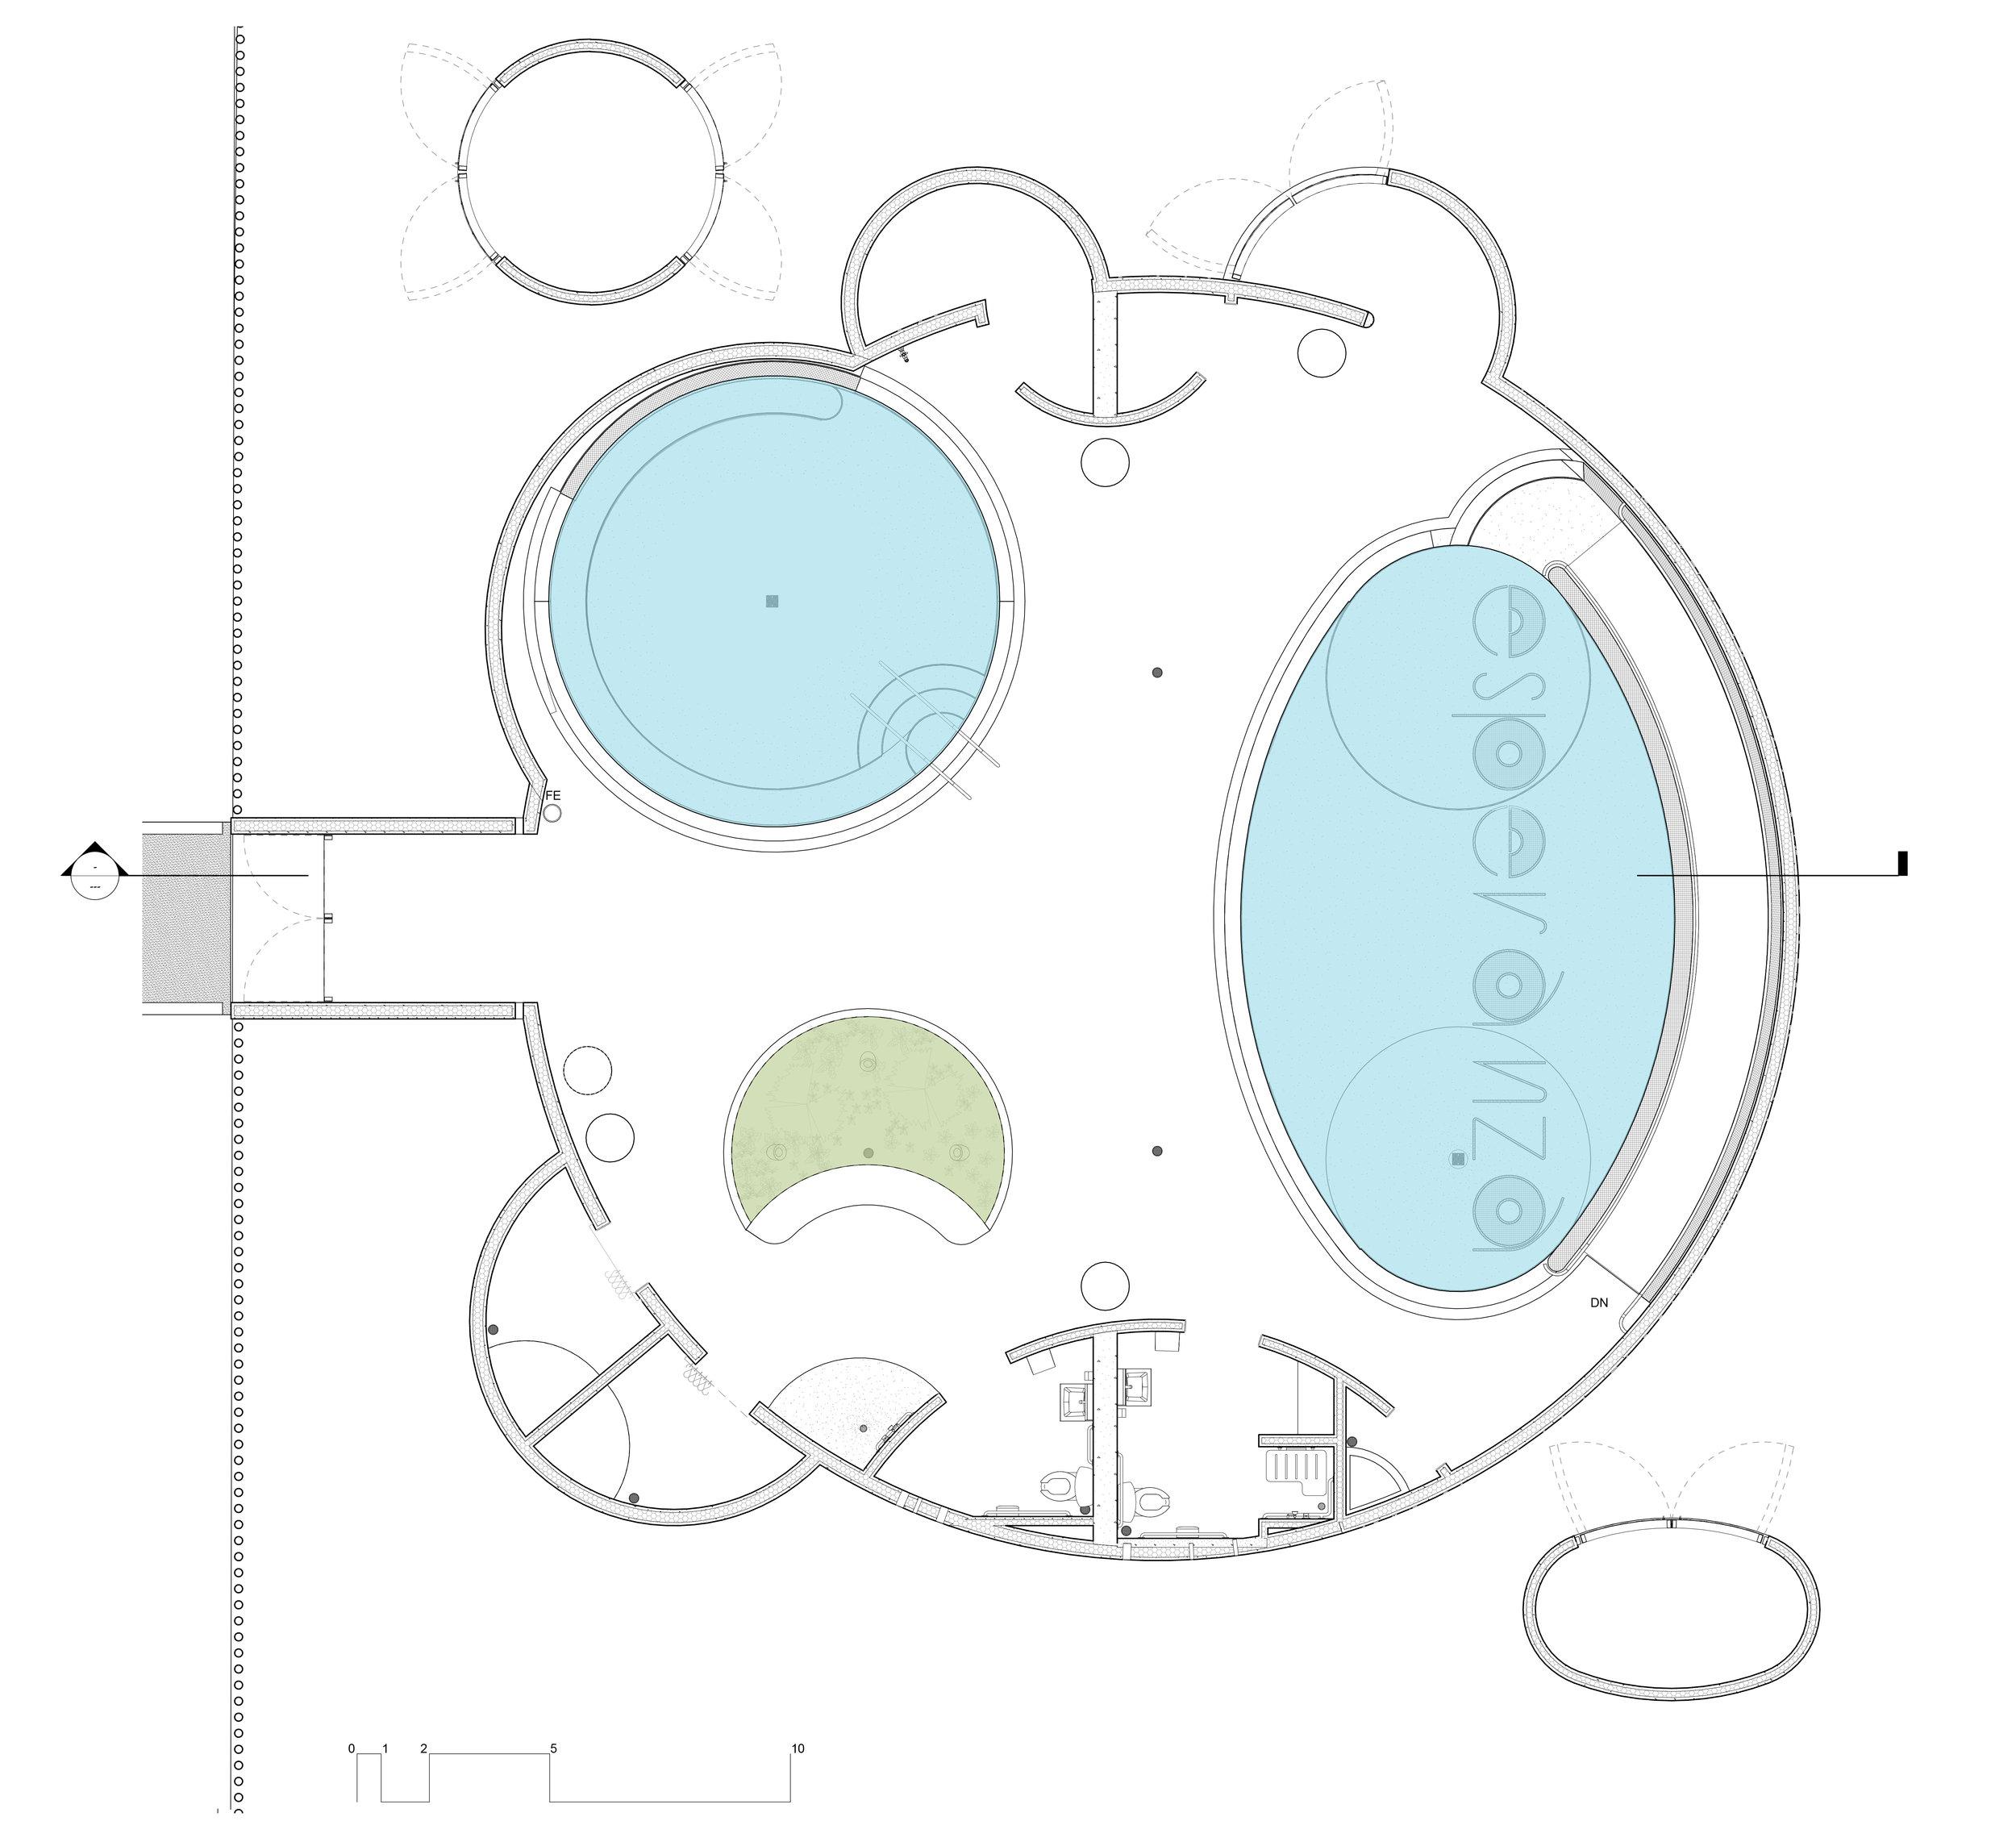 Piscinas_Terapeuticas_Therapeutic_Pools_San_Juan_Puerto_Rico_Fuster_Architects_Floor_Plan.jpg